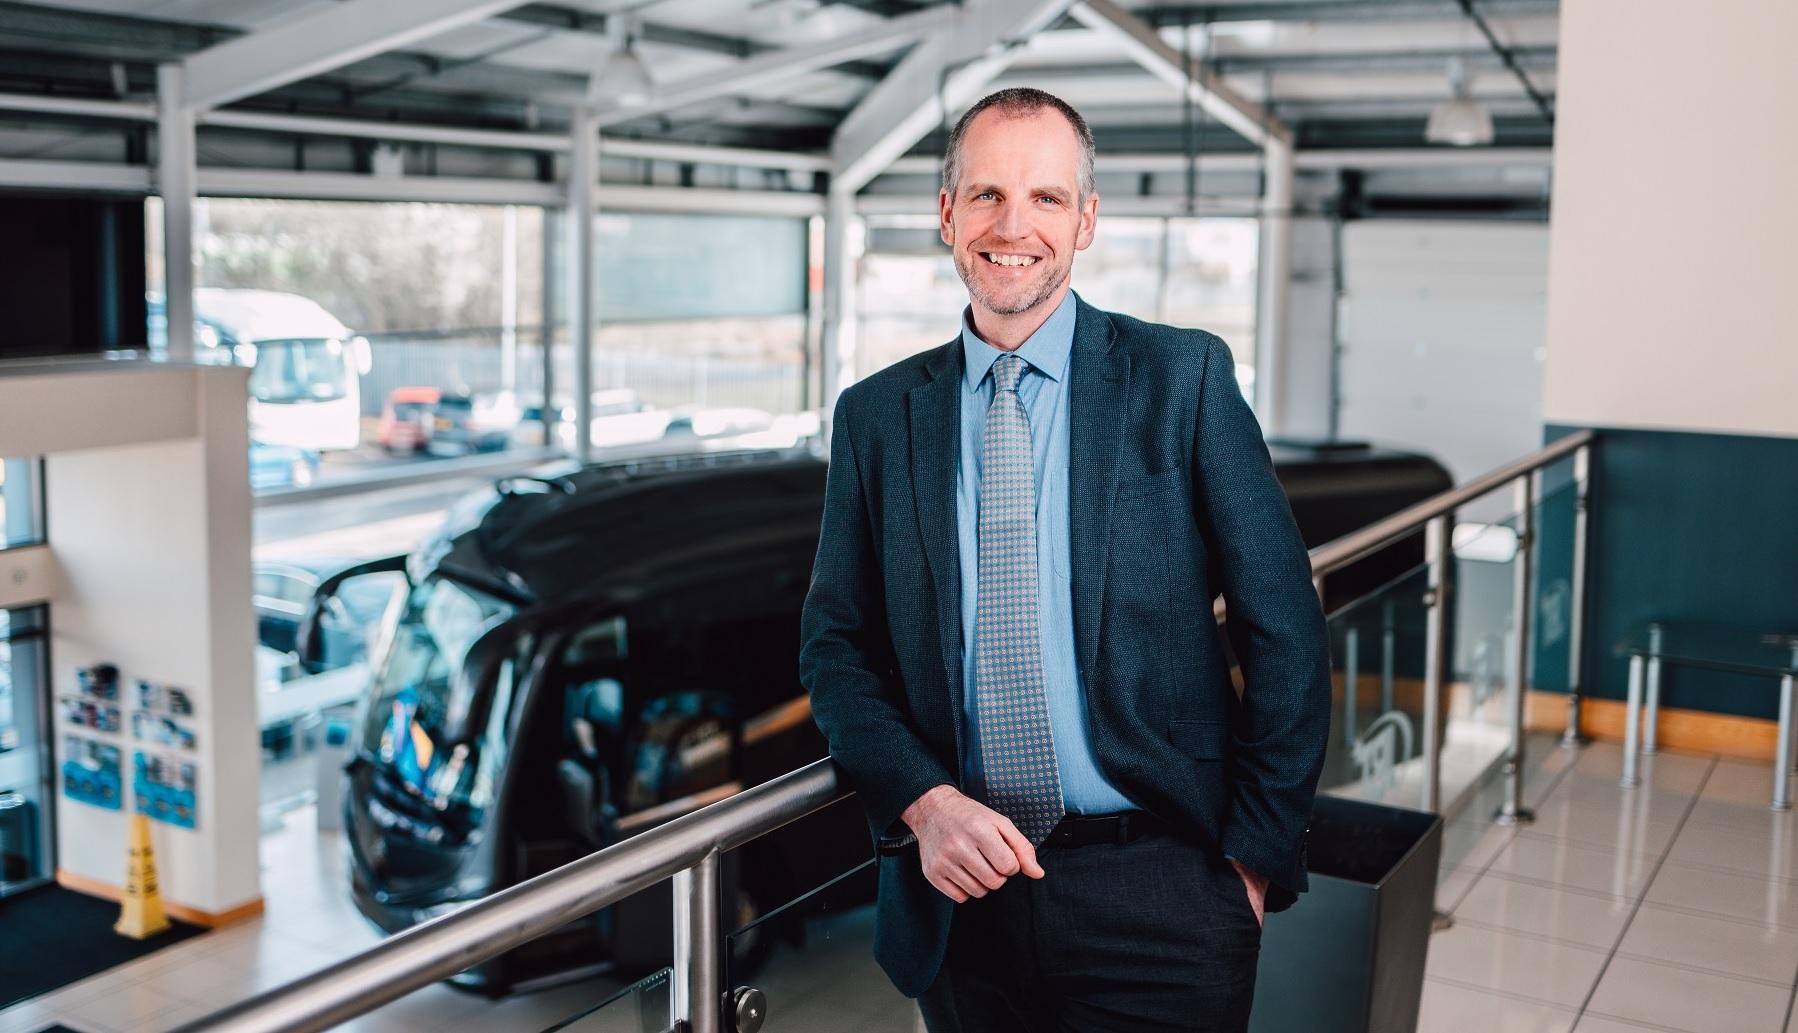 Andrew Blundell, Irizar UK Managing Director